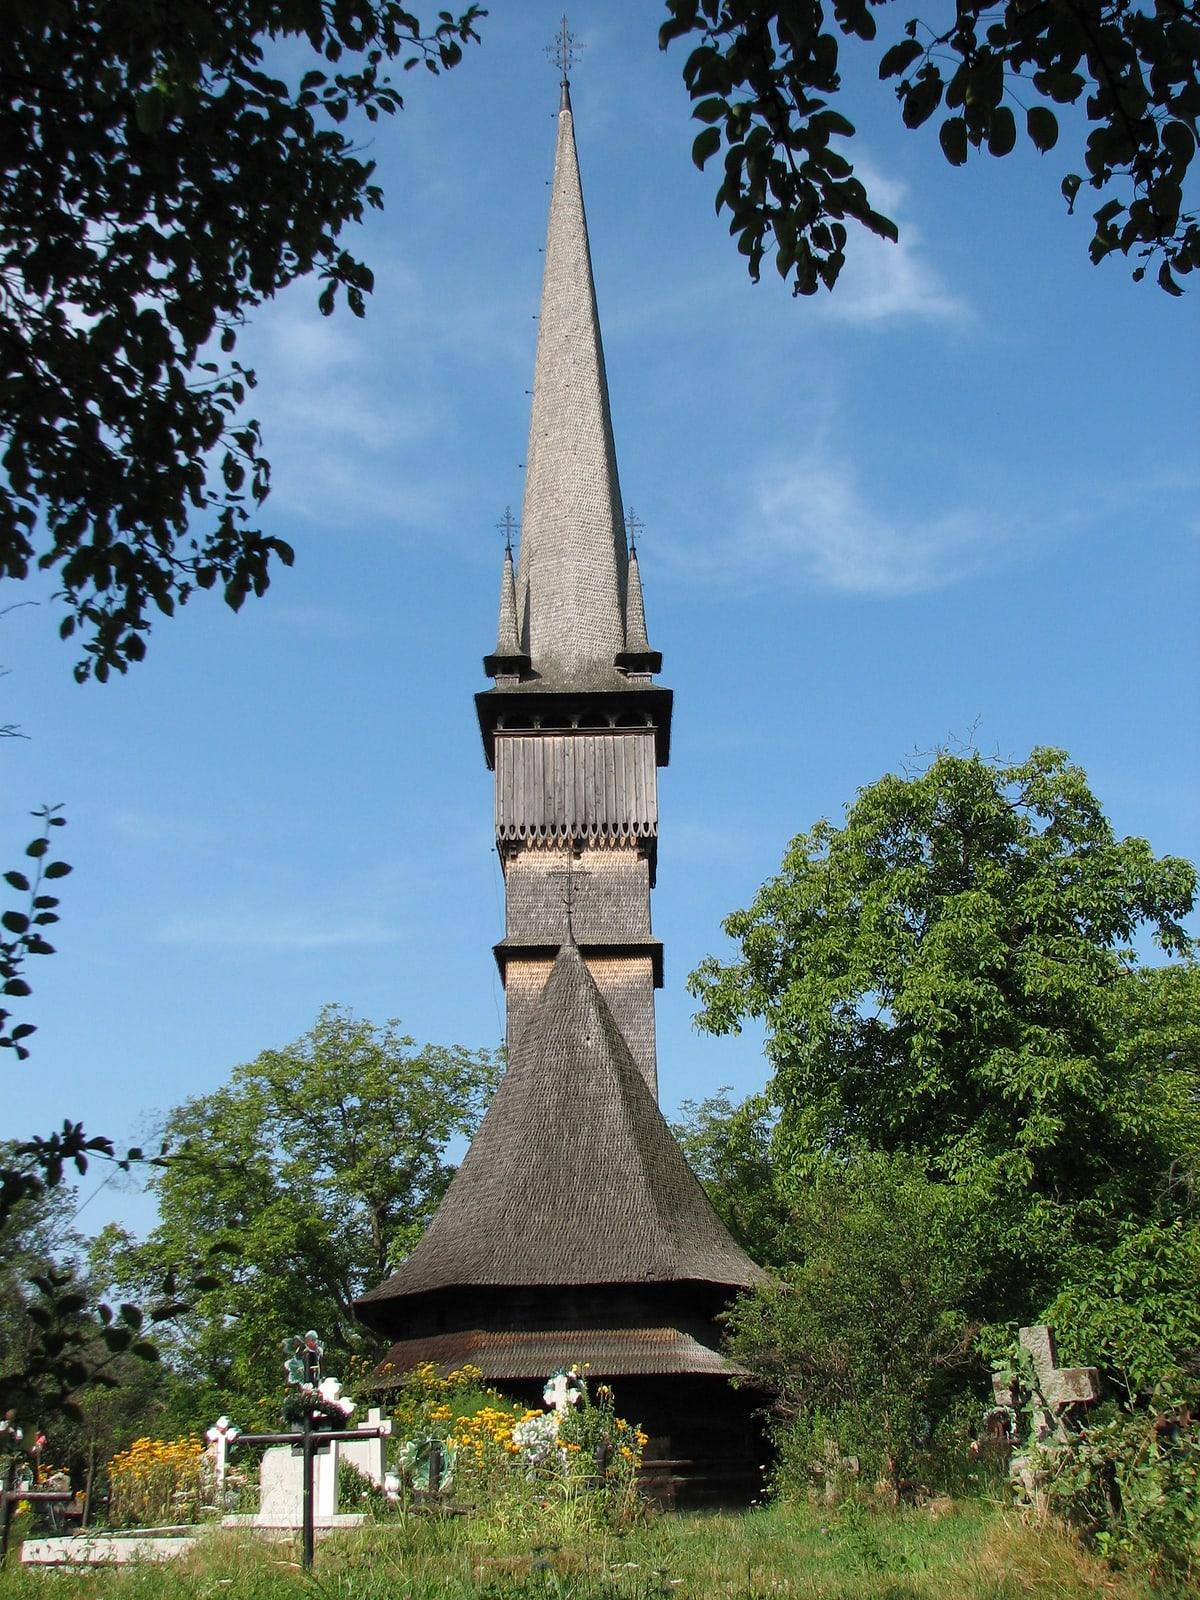 Surdesti Wooden Church